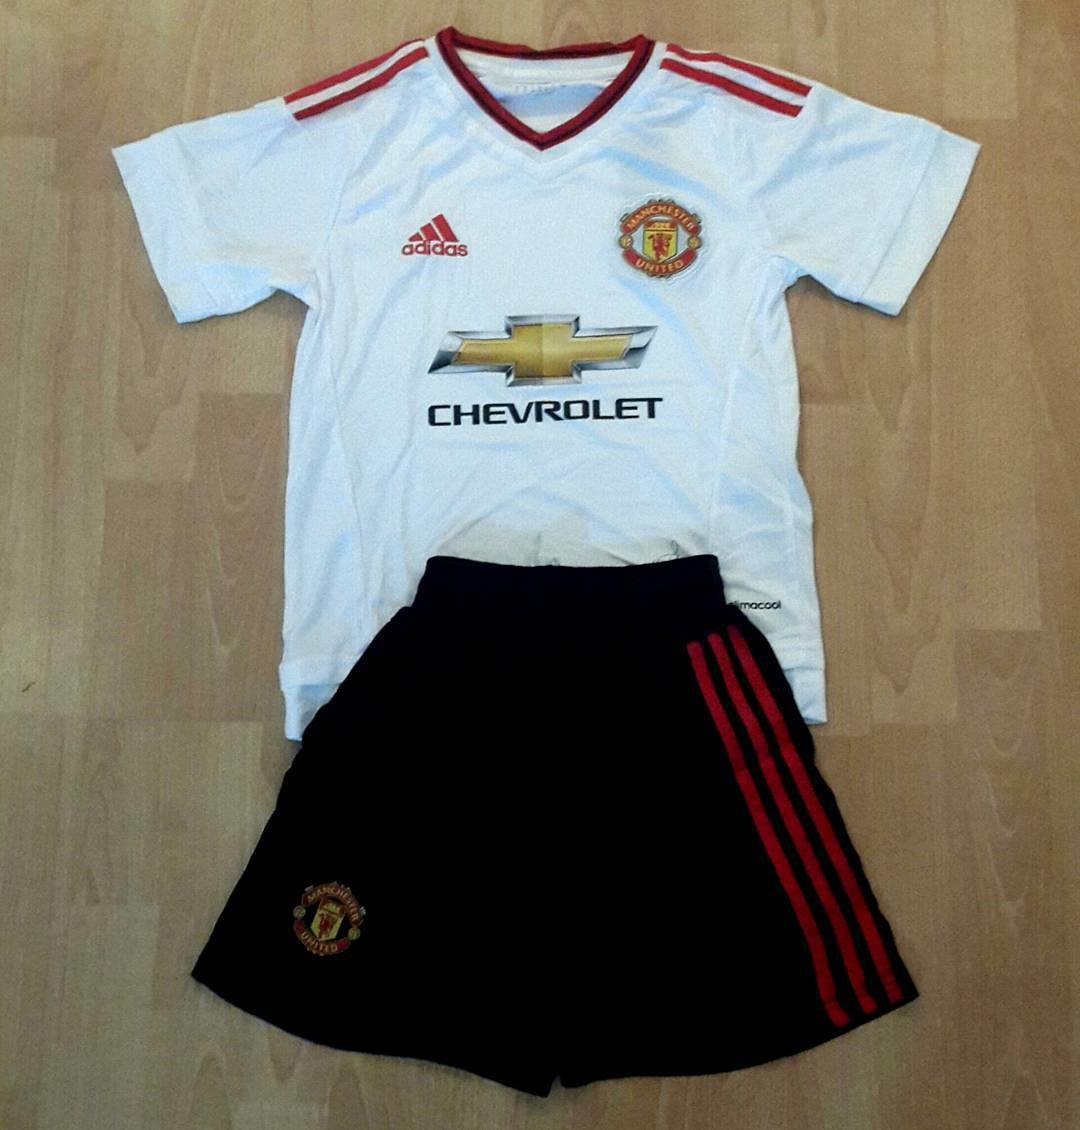 fcb10909d Jual jersey kids Manchester united away terbaru Adidas musim 2015 ...